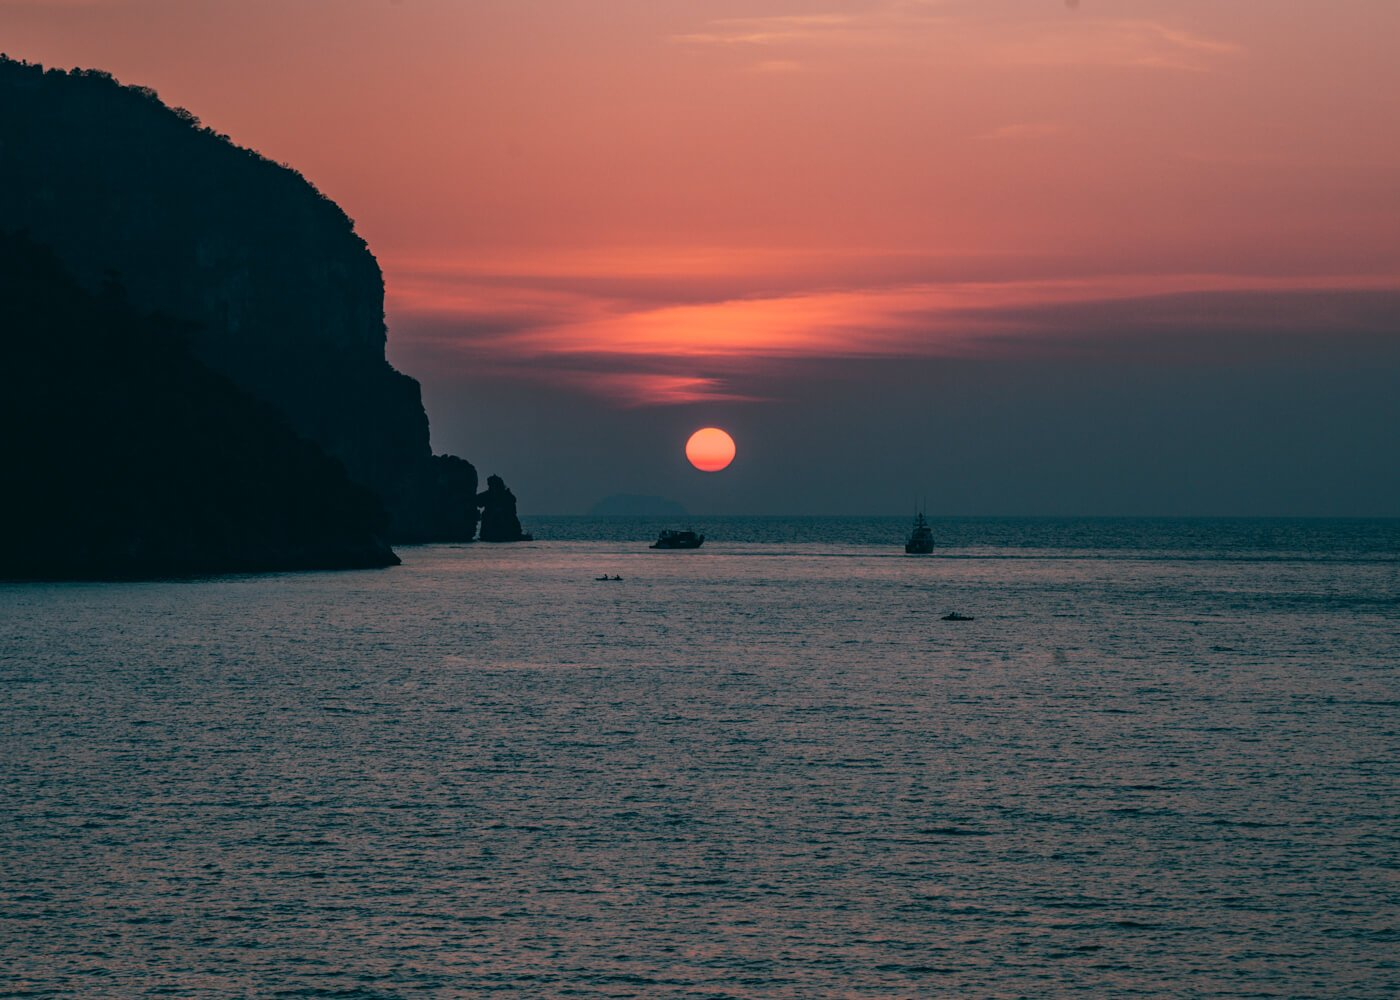 Pôr do sol visto da piscina do hotel The Cobble Beach - Phi Phi Island